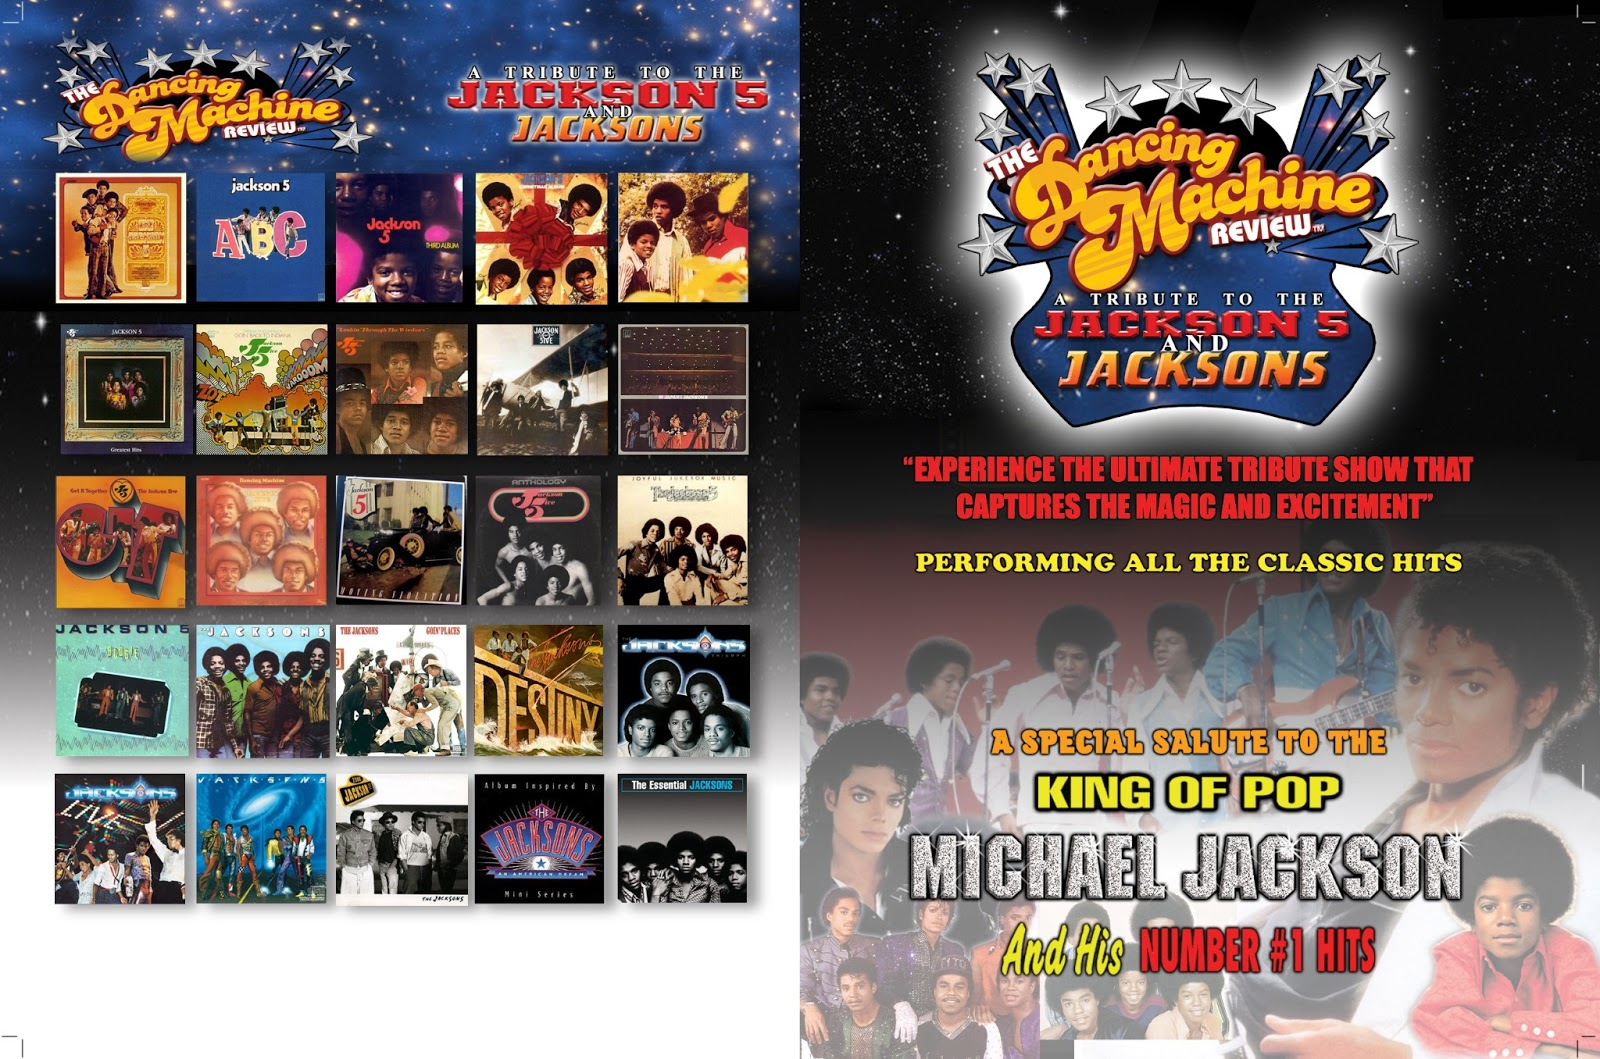 Kingofpopbrochurebleed copy.jpg